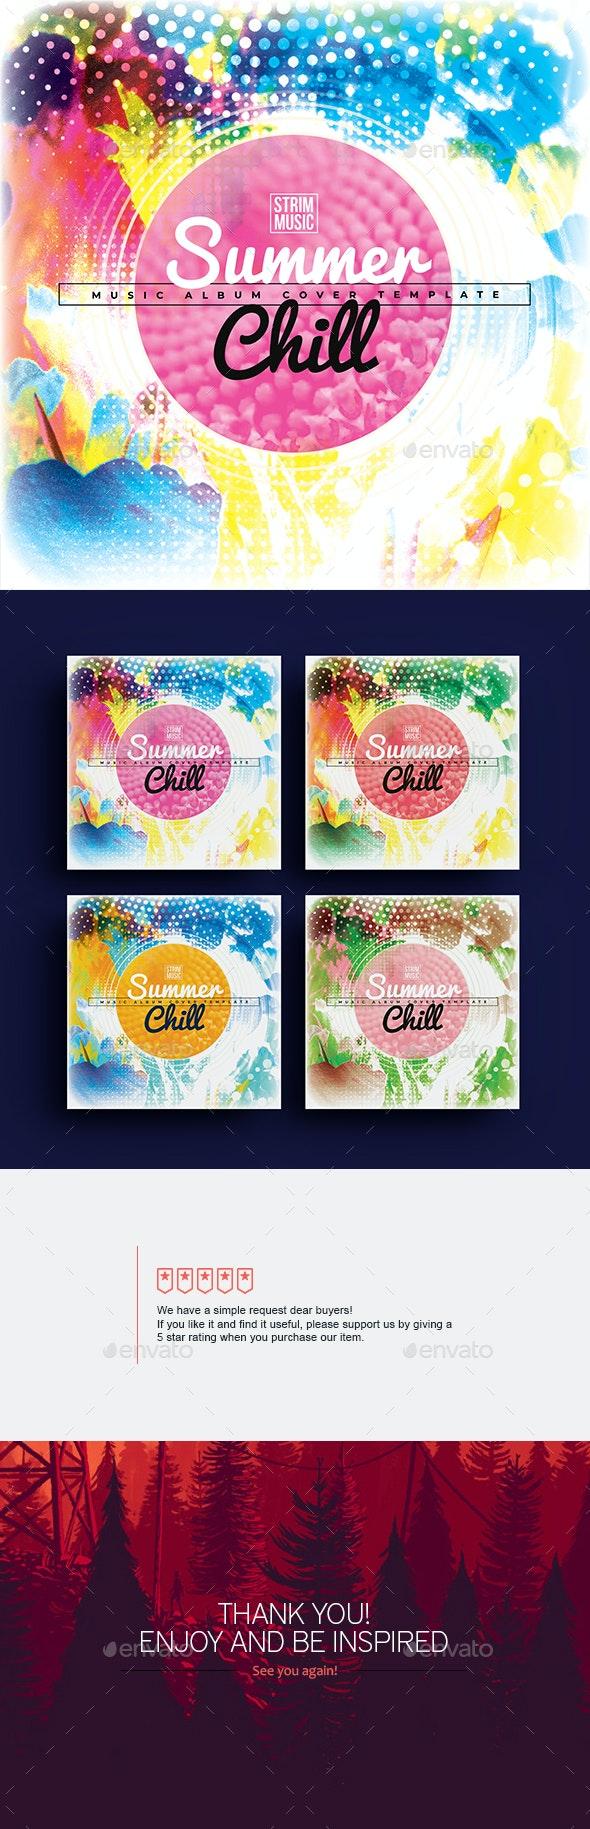 Summer Chill - Music Album Cover - Miscellaneous Social Media